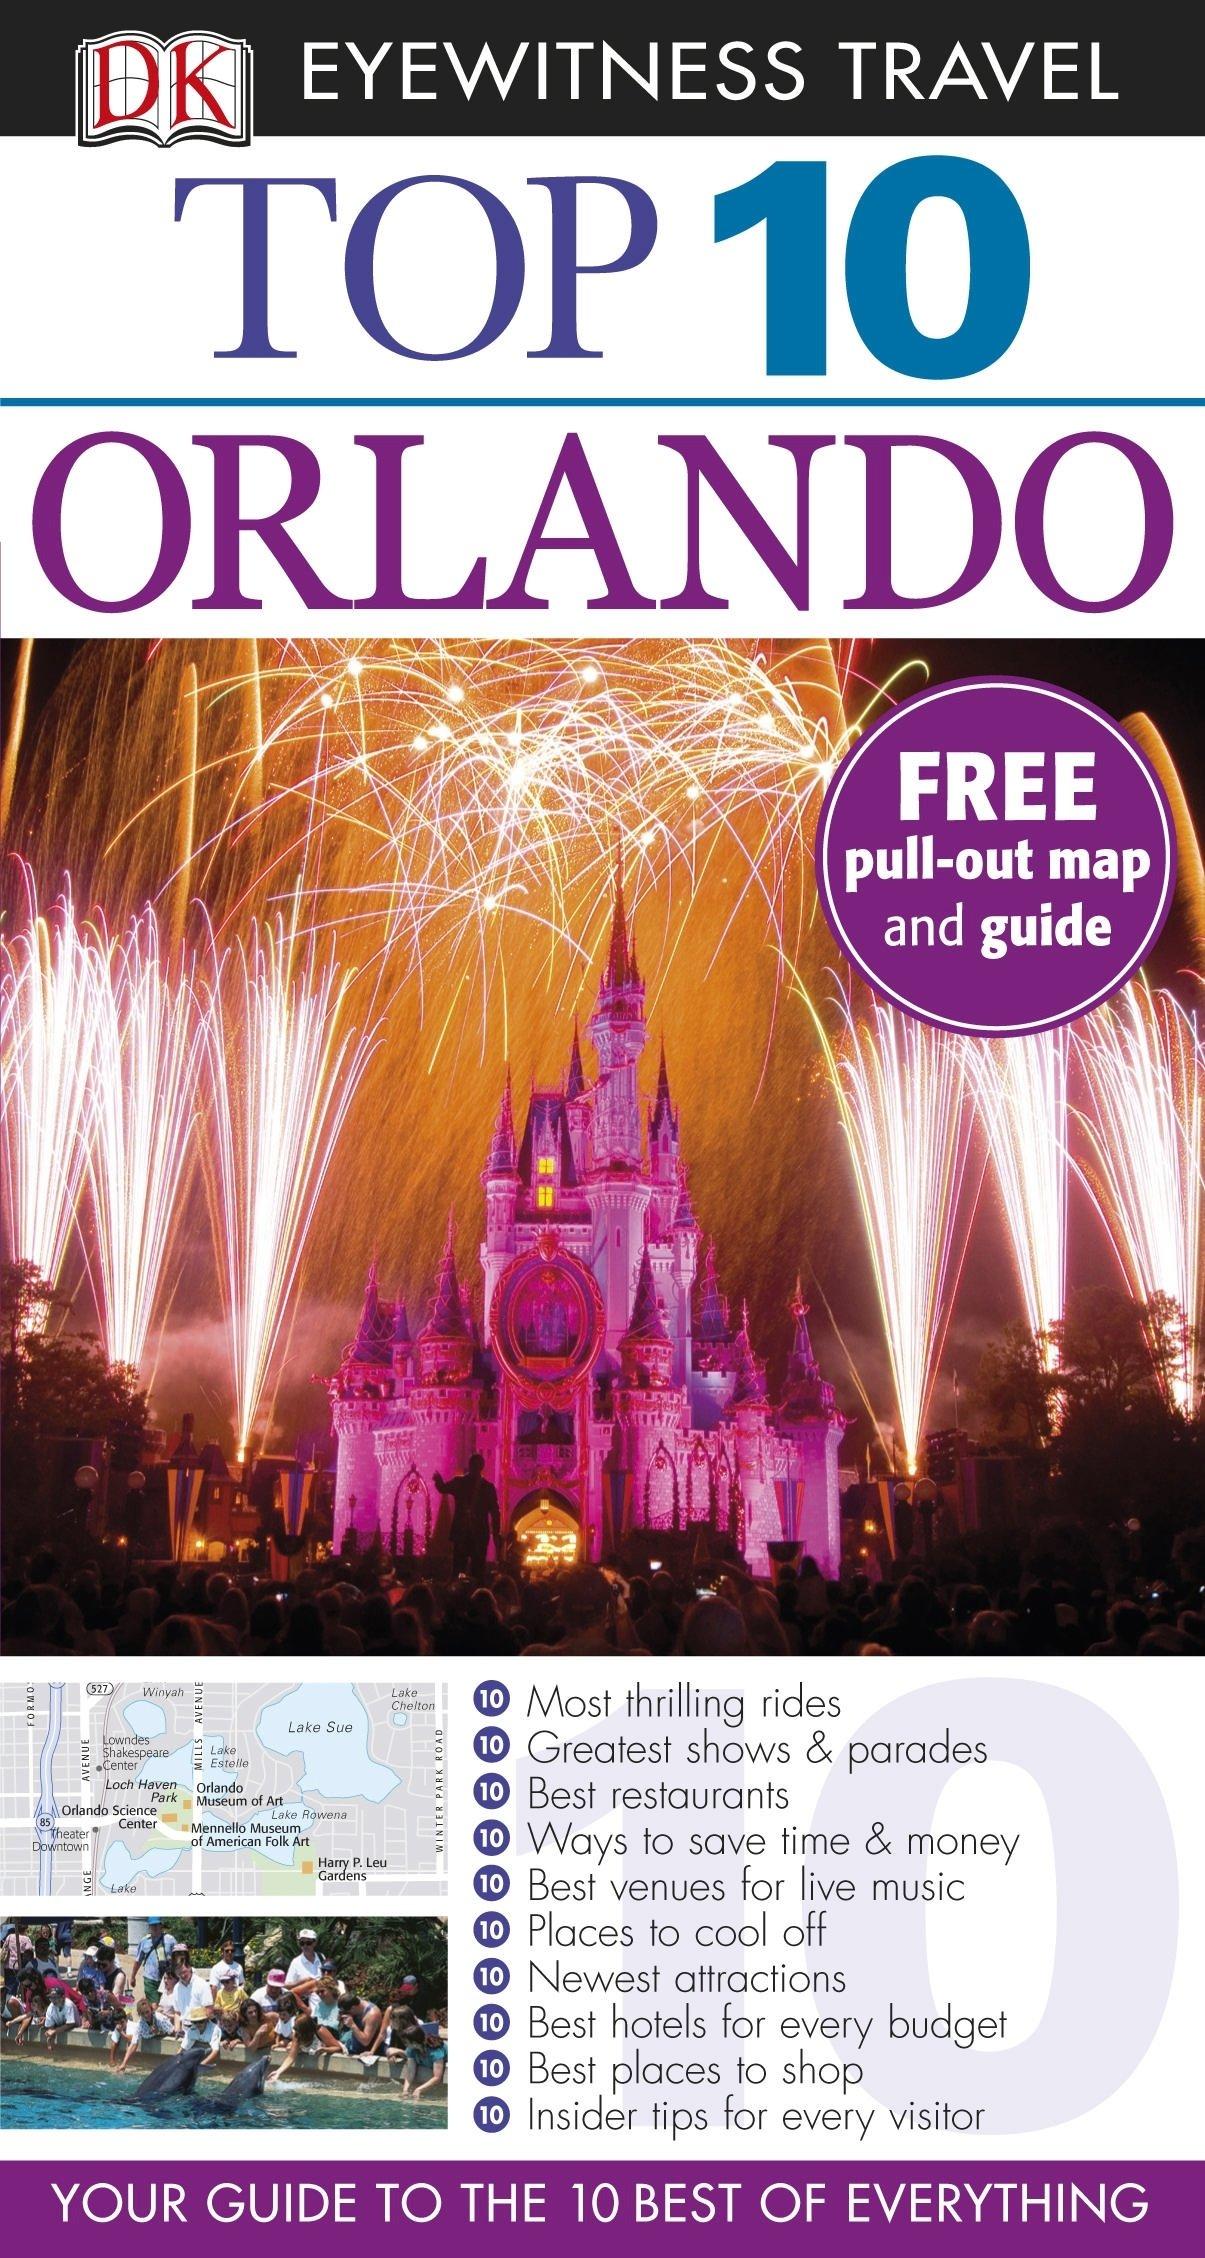 58745ffe027782 DK Eyewitness Top 10 Travel Guide: Orlando (DK Eyewitness Travel Guide)  Paperback – August 1, 2012